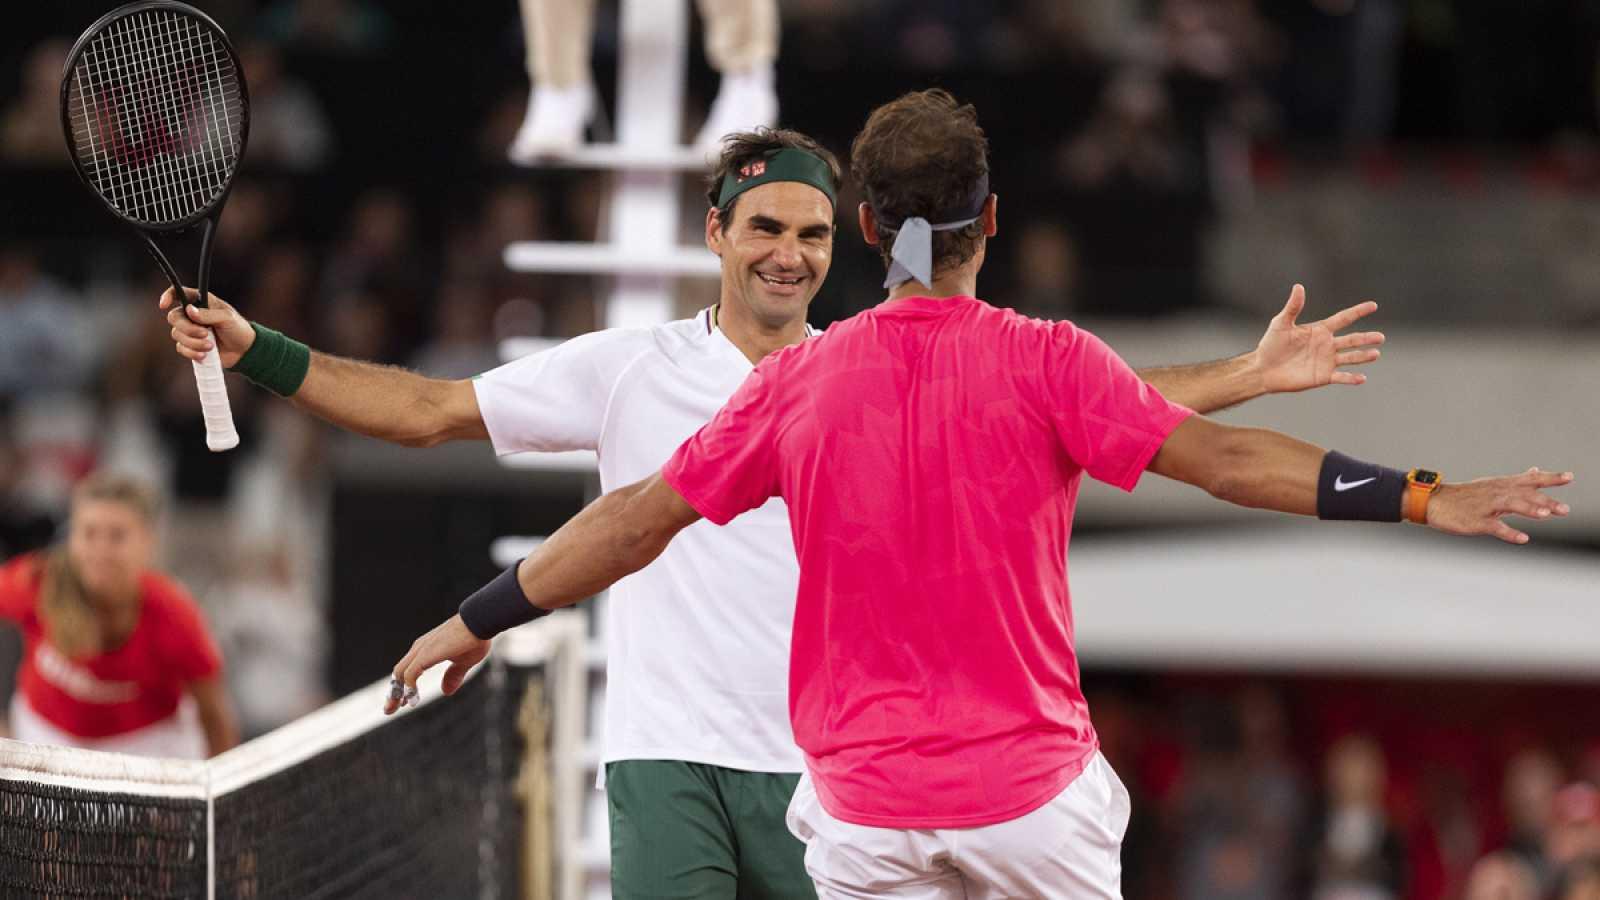 Roger Federer v Rafael Nadal Match in Africa